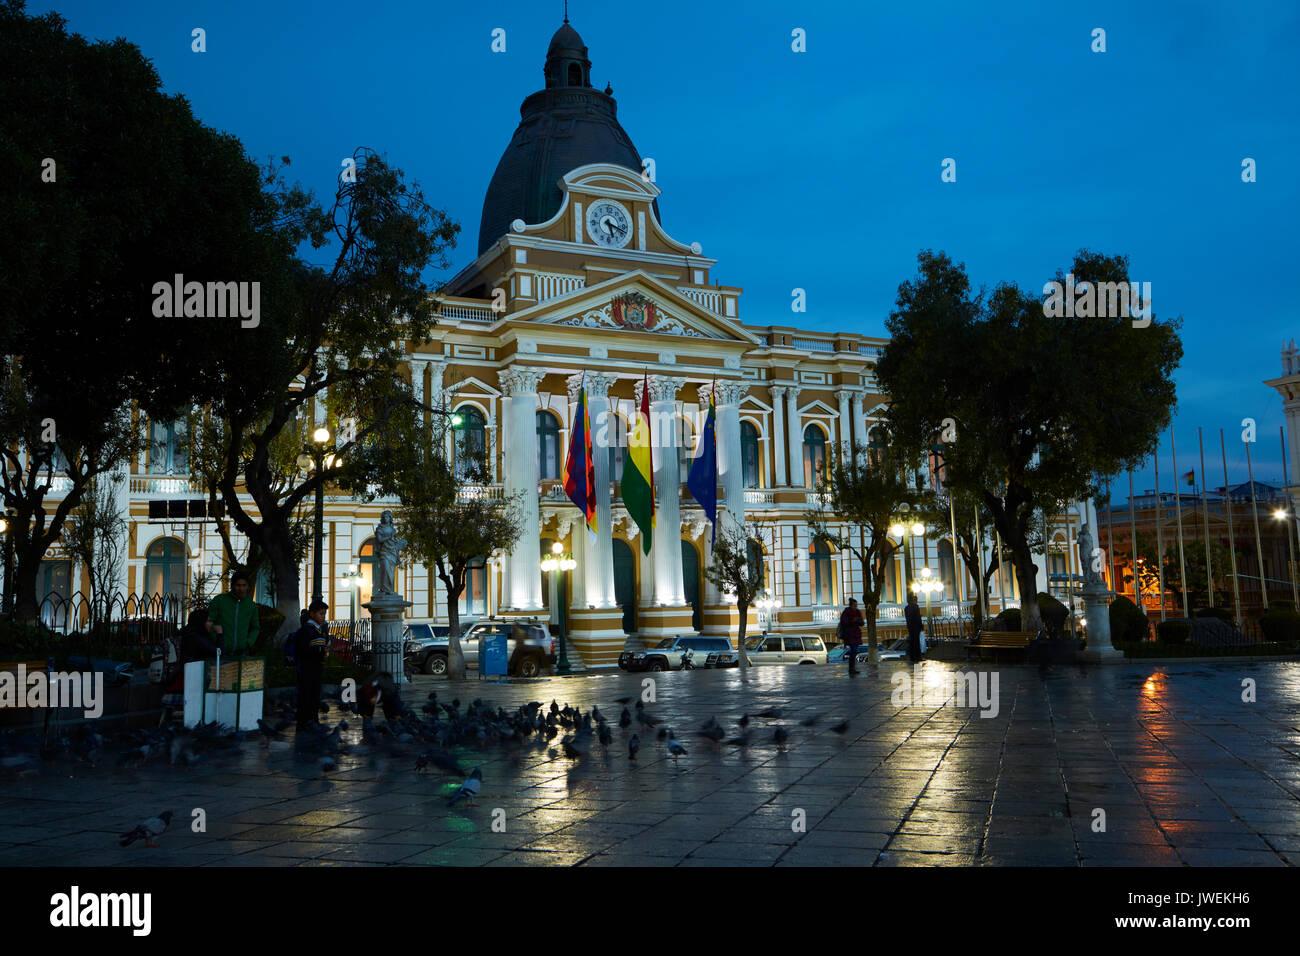 National Congress of Bolivia building at dusk, Plaza Murillo, La Paz, Bolivia, South America - Stock Image